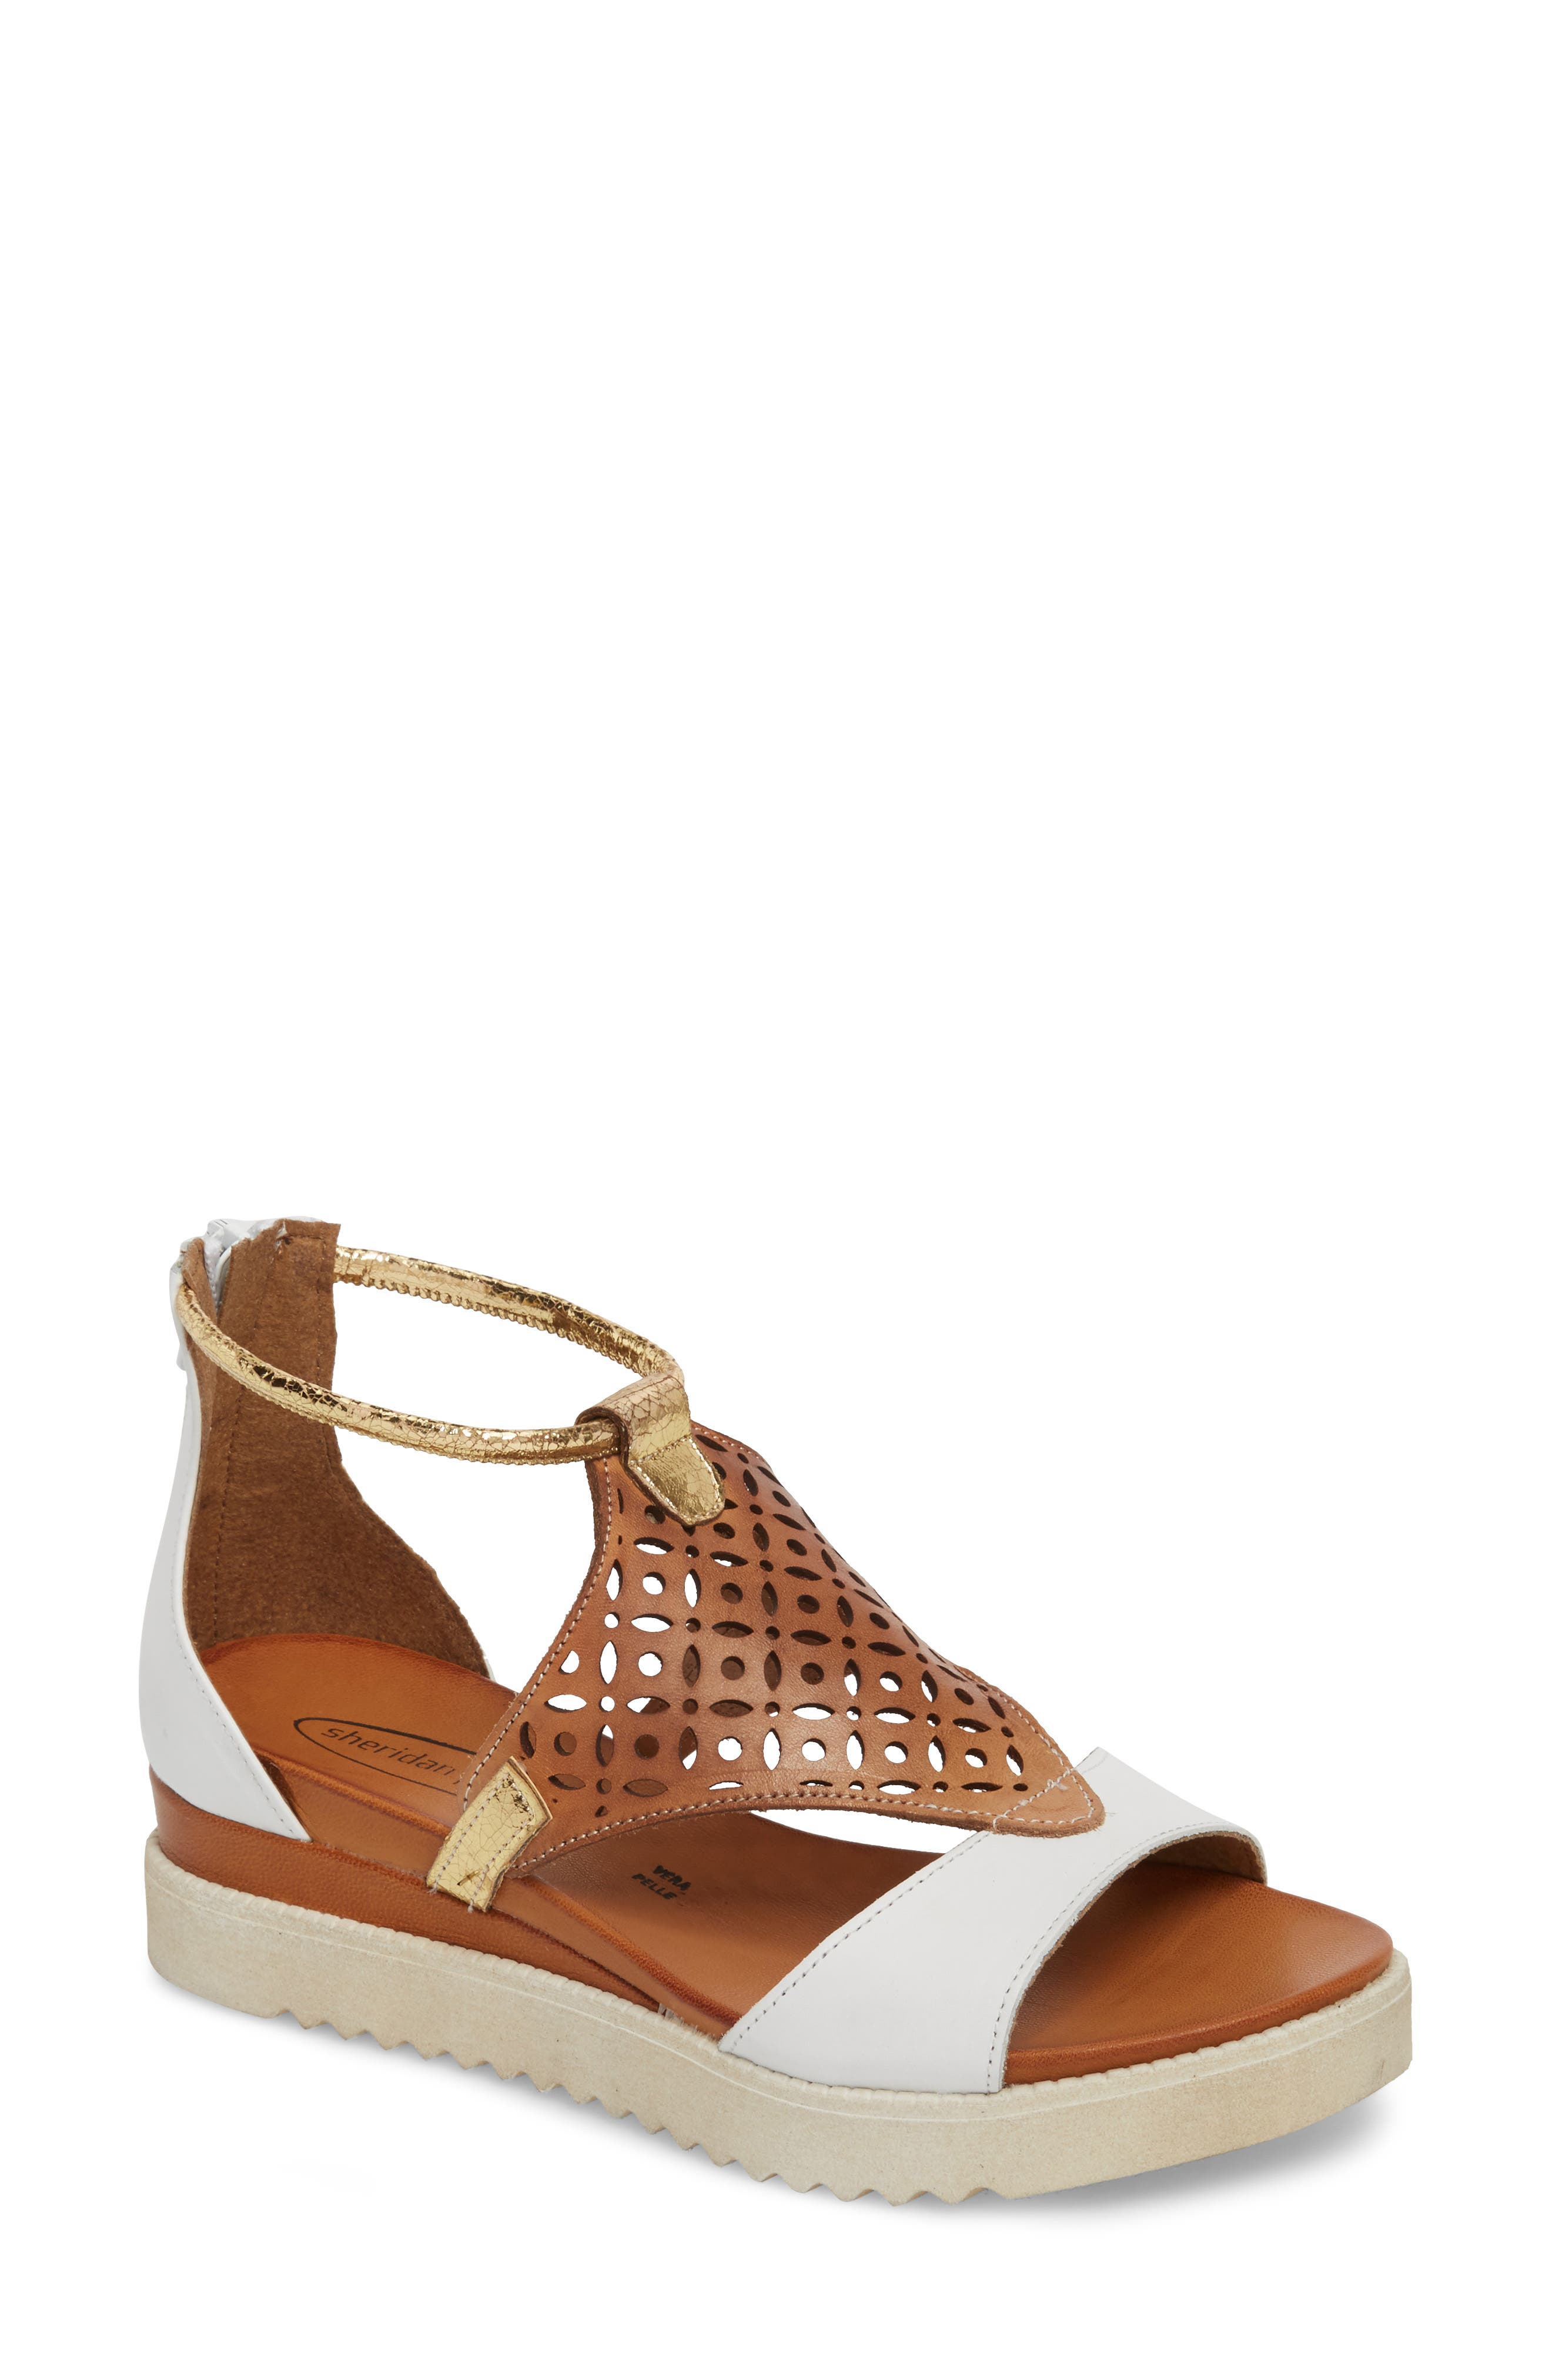 Blaze Sandal,                         Main,                         color, White Combo Leather